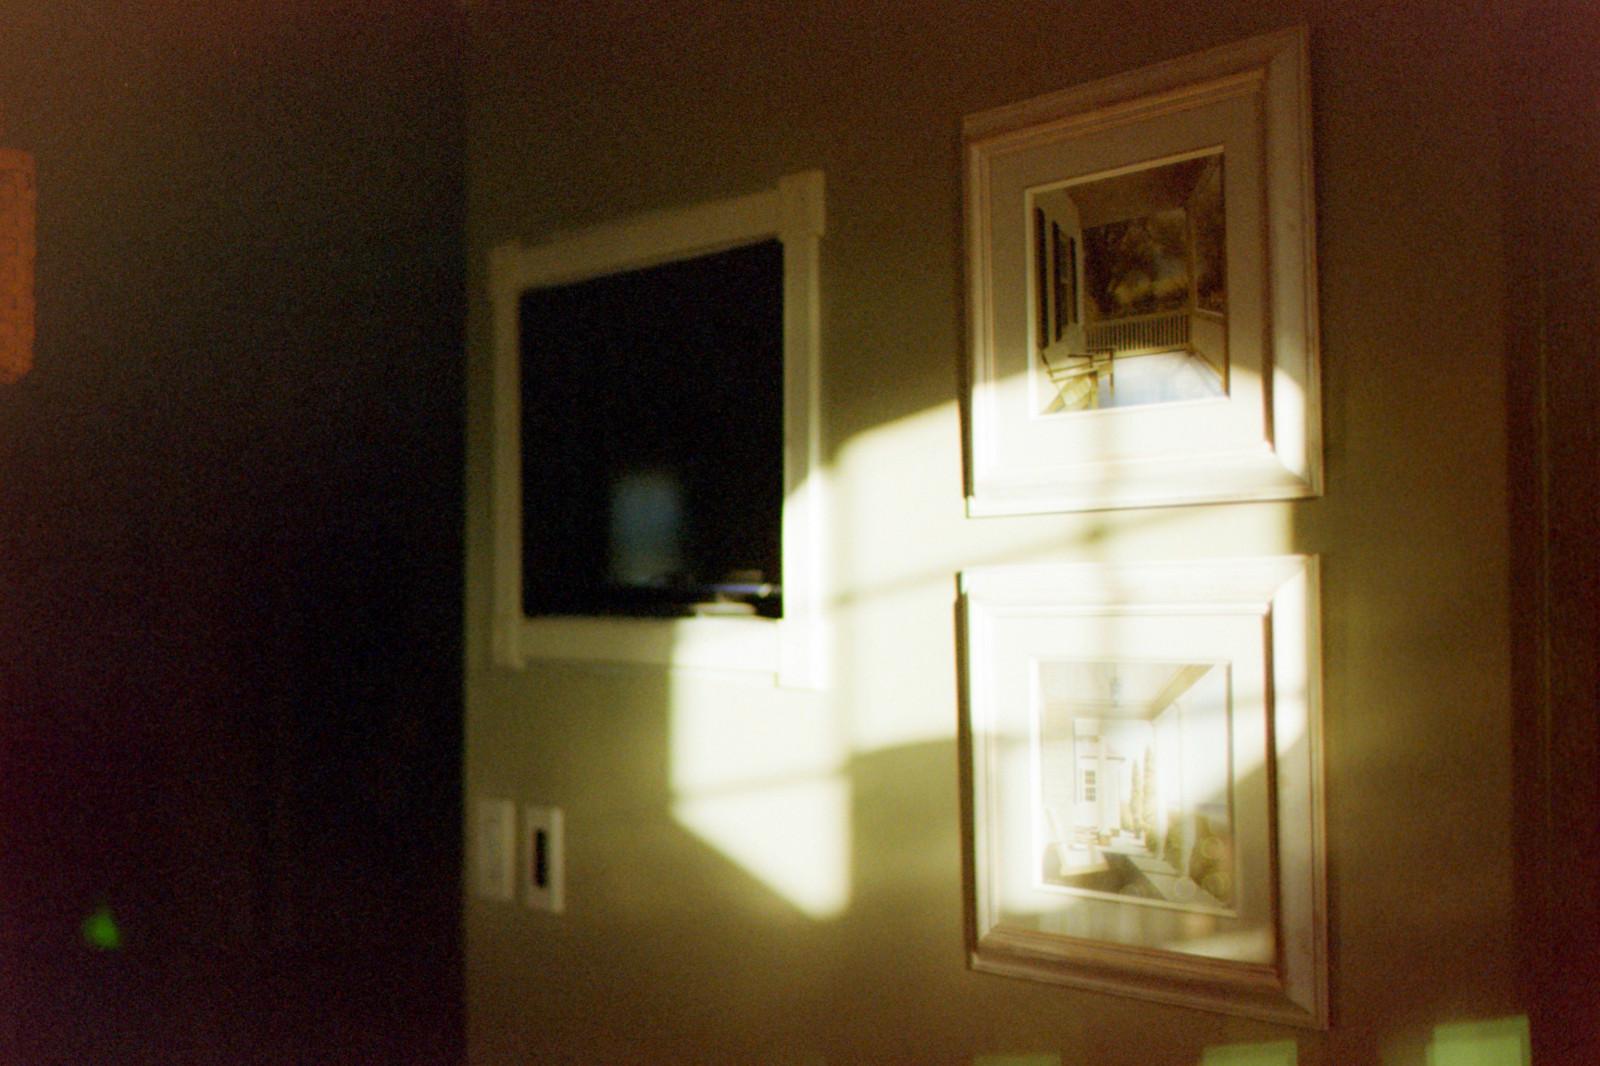 Hintergrundbilder : Landschaft, alt, Fenster, Zimmer, Mauer ...